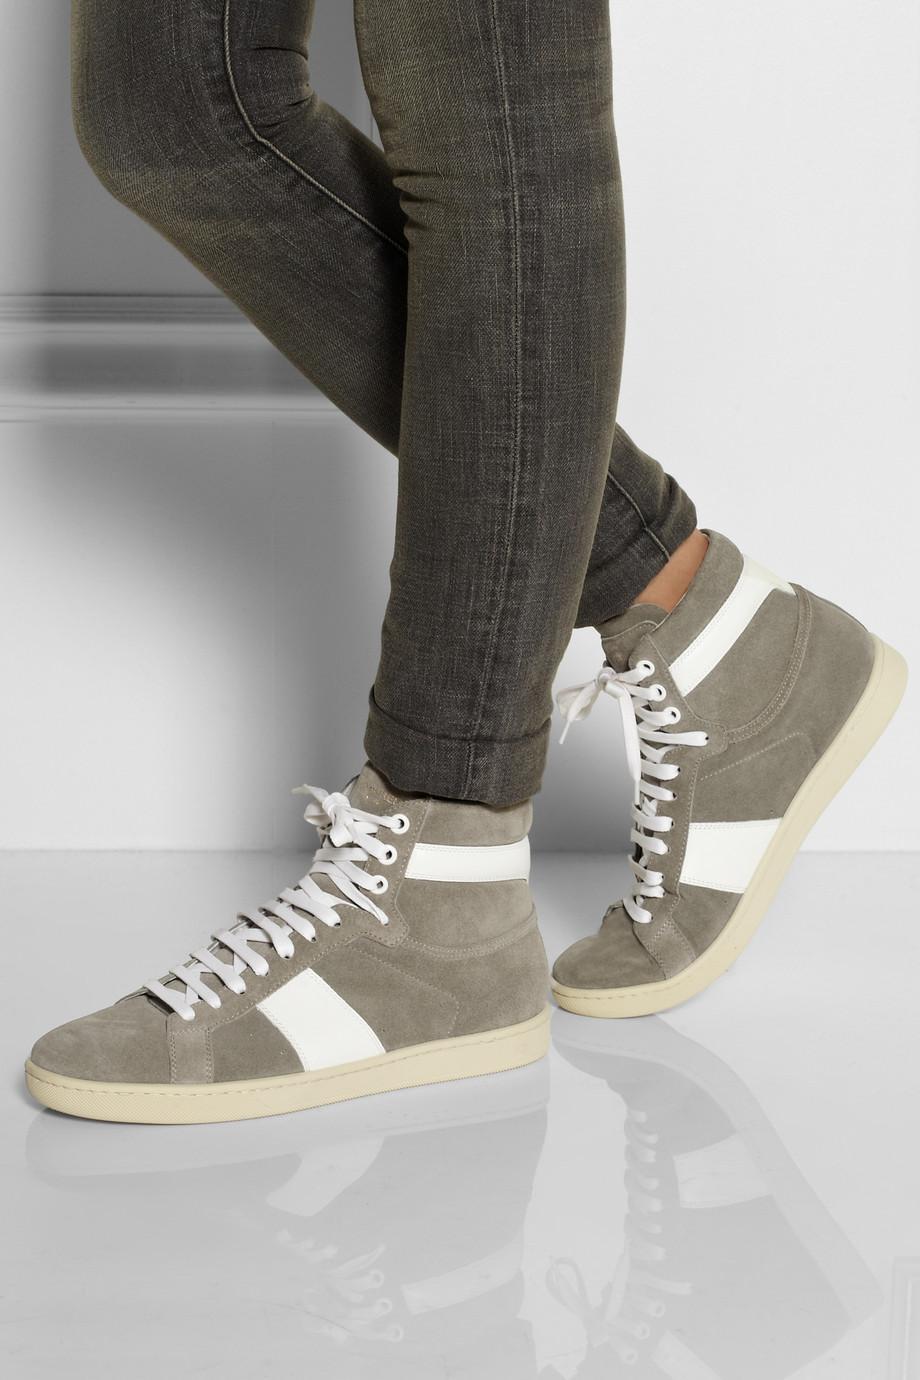 saint laurent leathertrimmed suede hightop sneakers in gray lyst. Black Bedroom Furniture Sets. Home Design Ideas